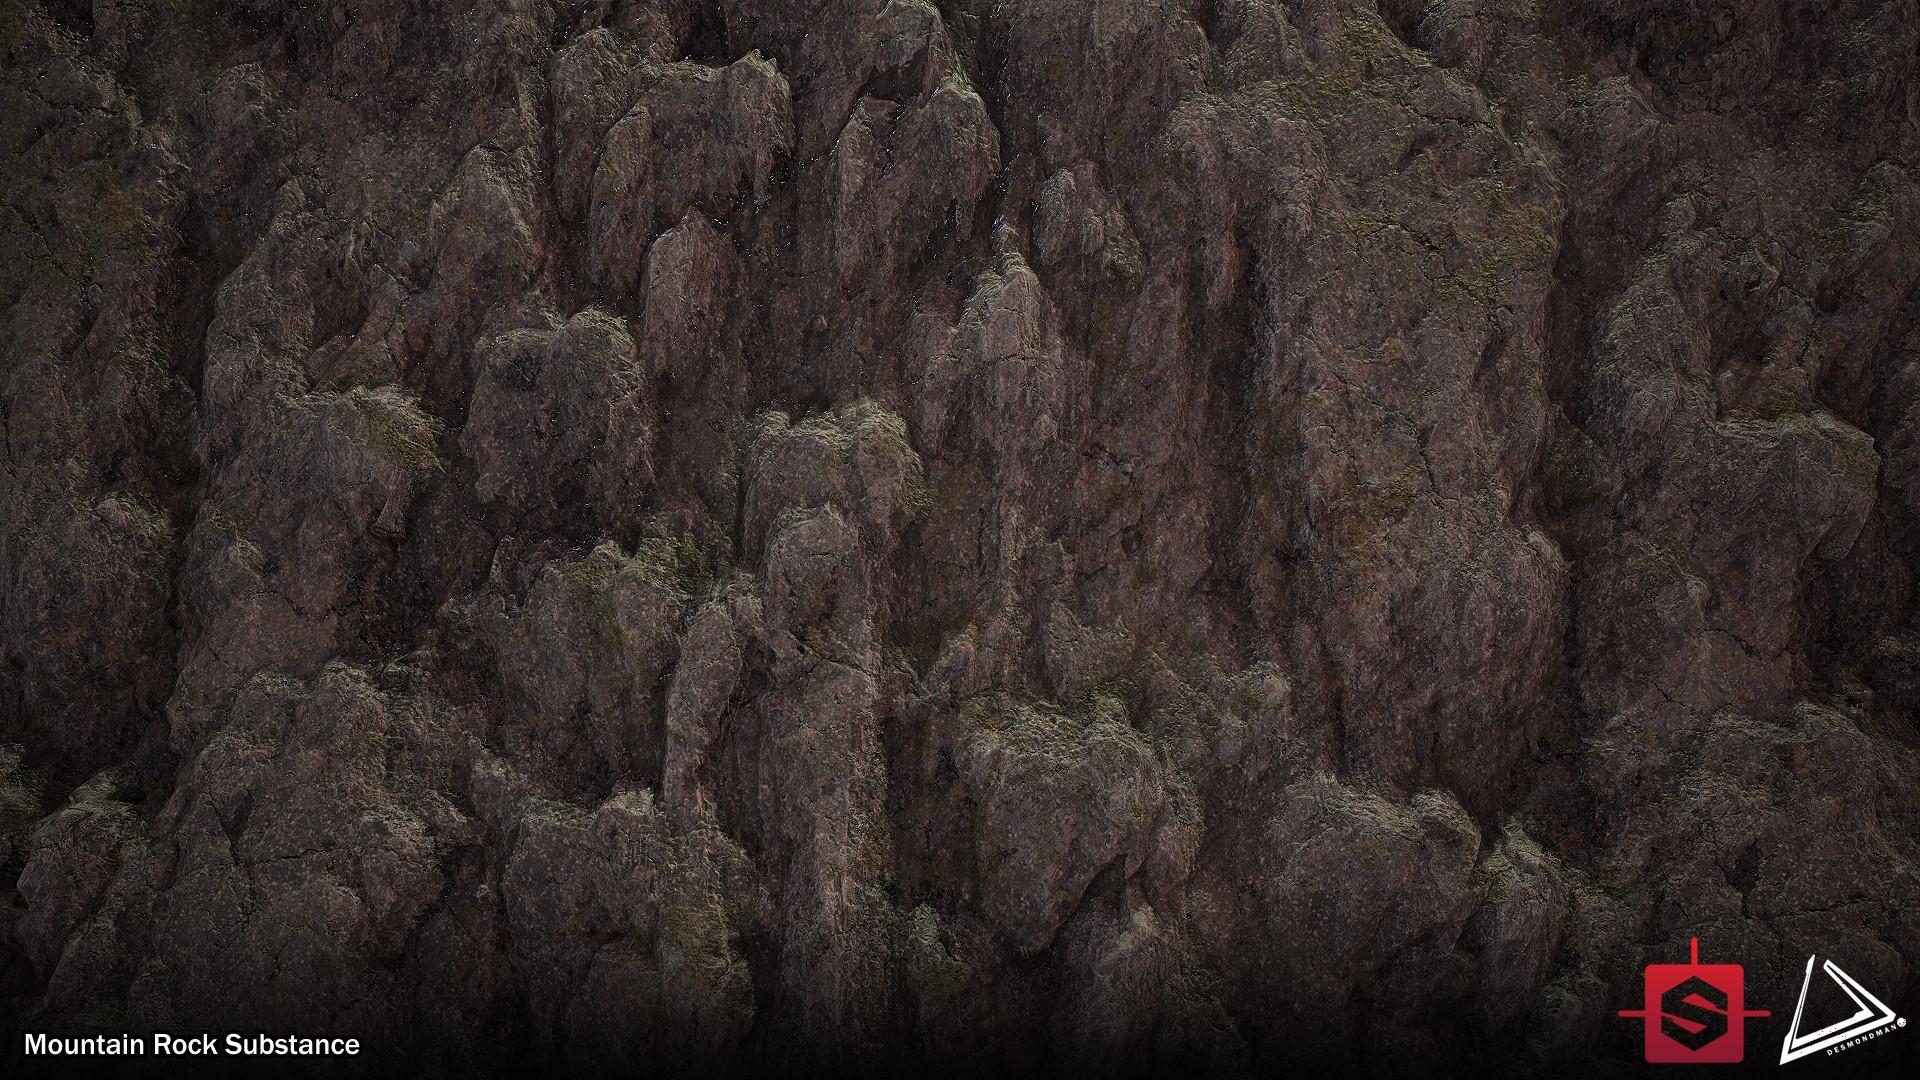 Desmond man sbwc mountainrock01 showcase04